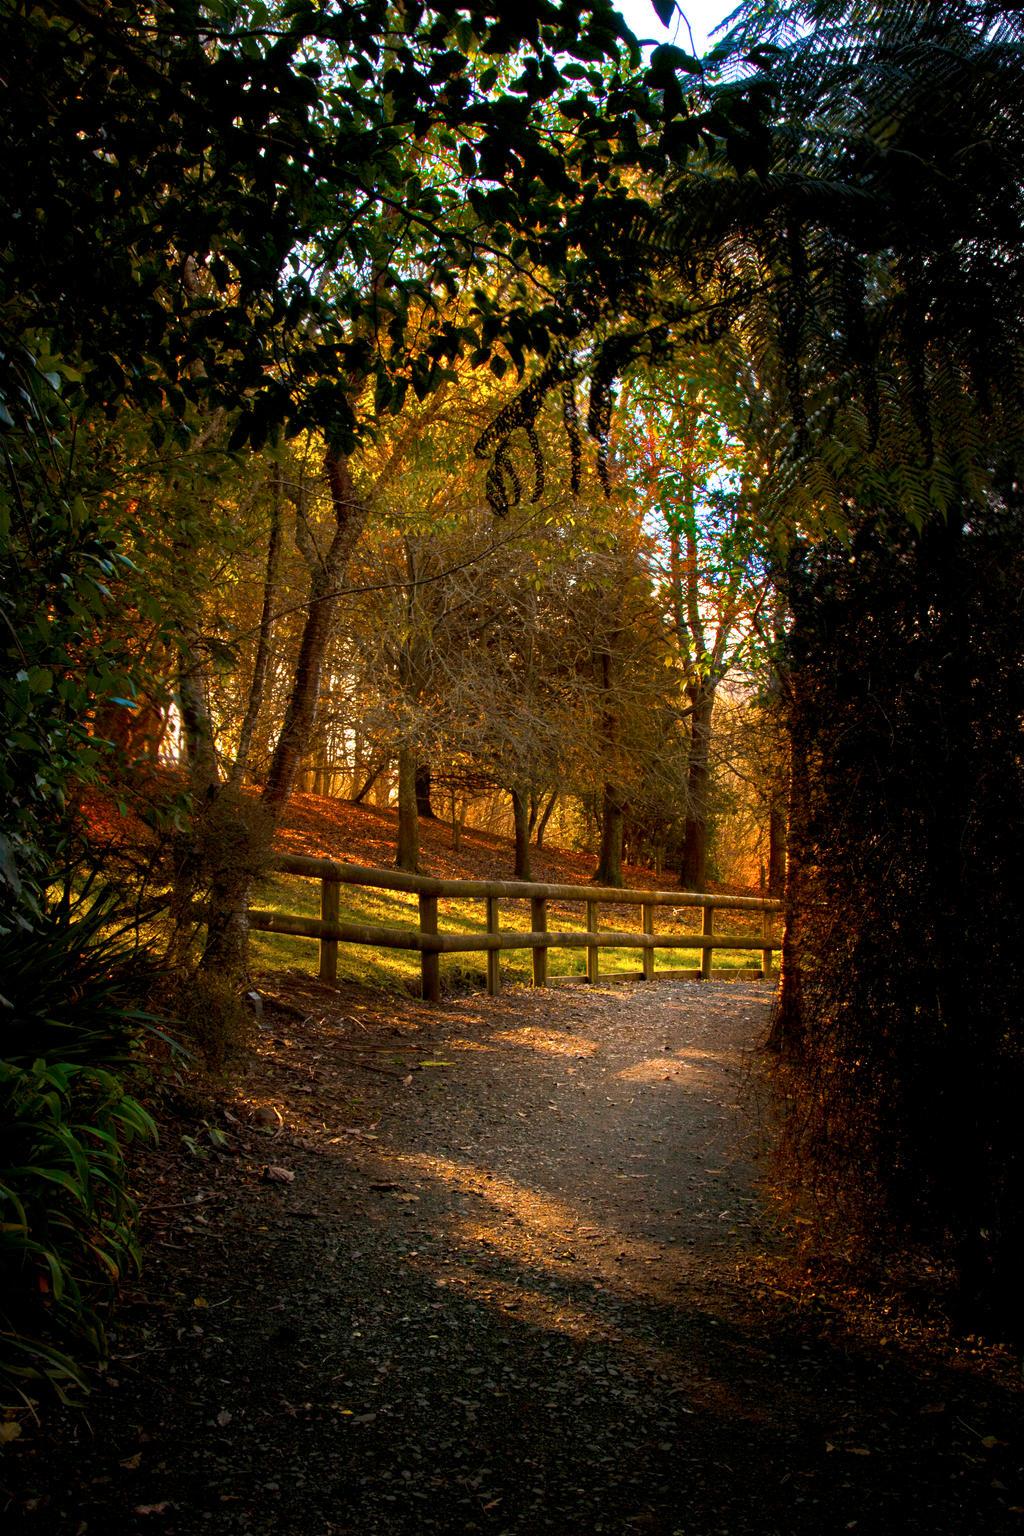 Enchanted forest 7 by CathleenTarawhiti